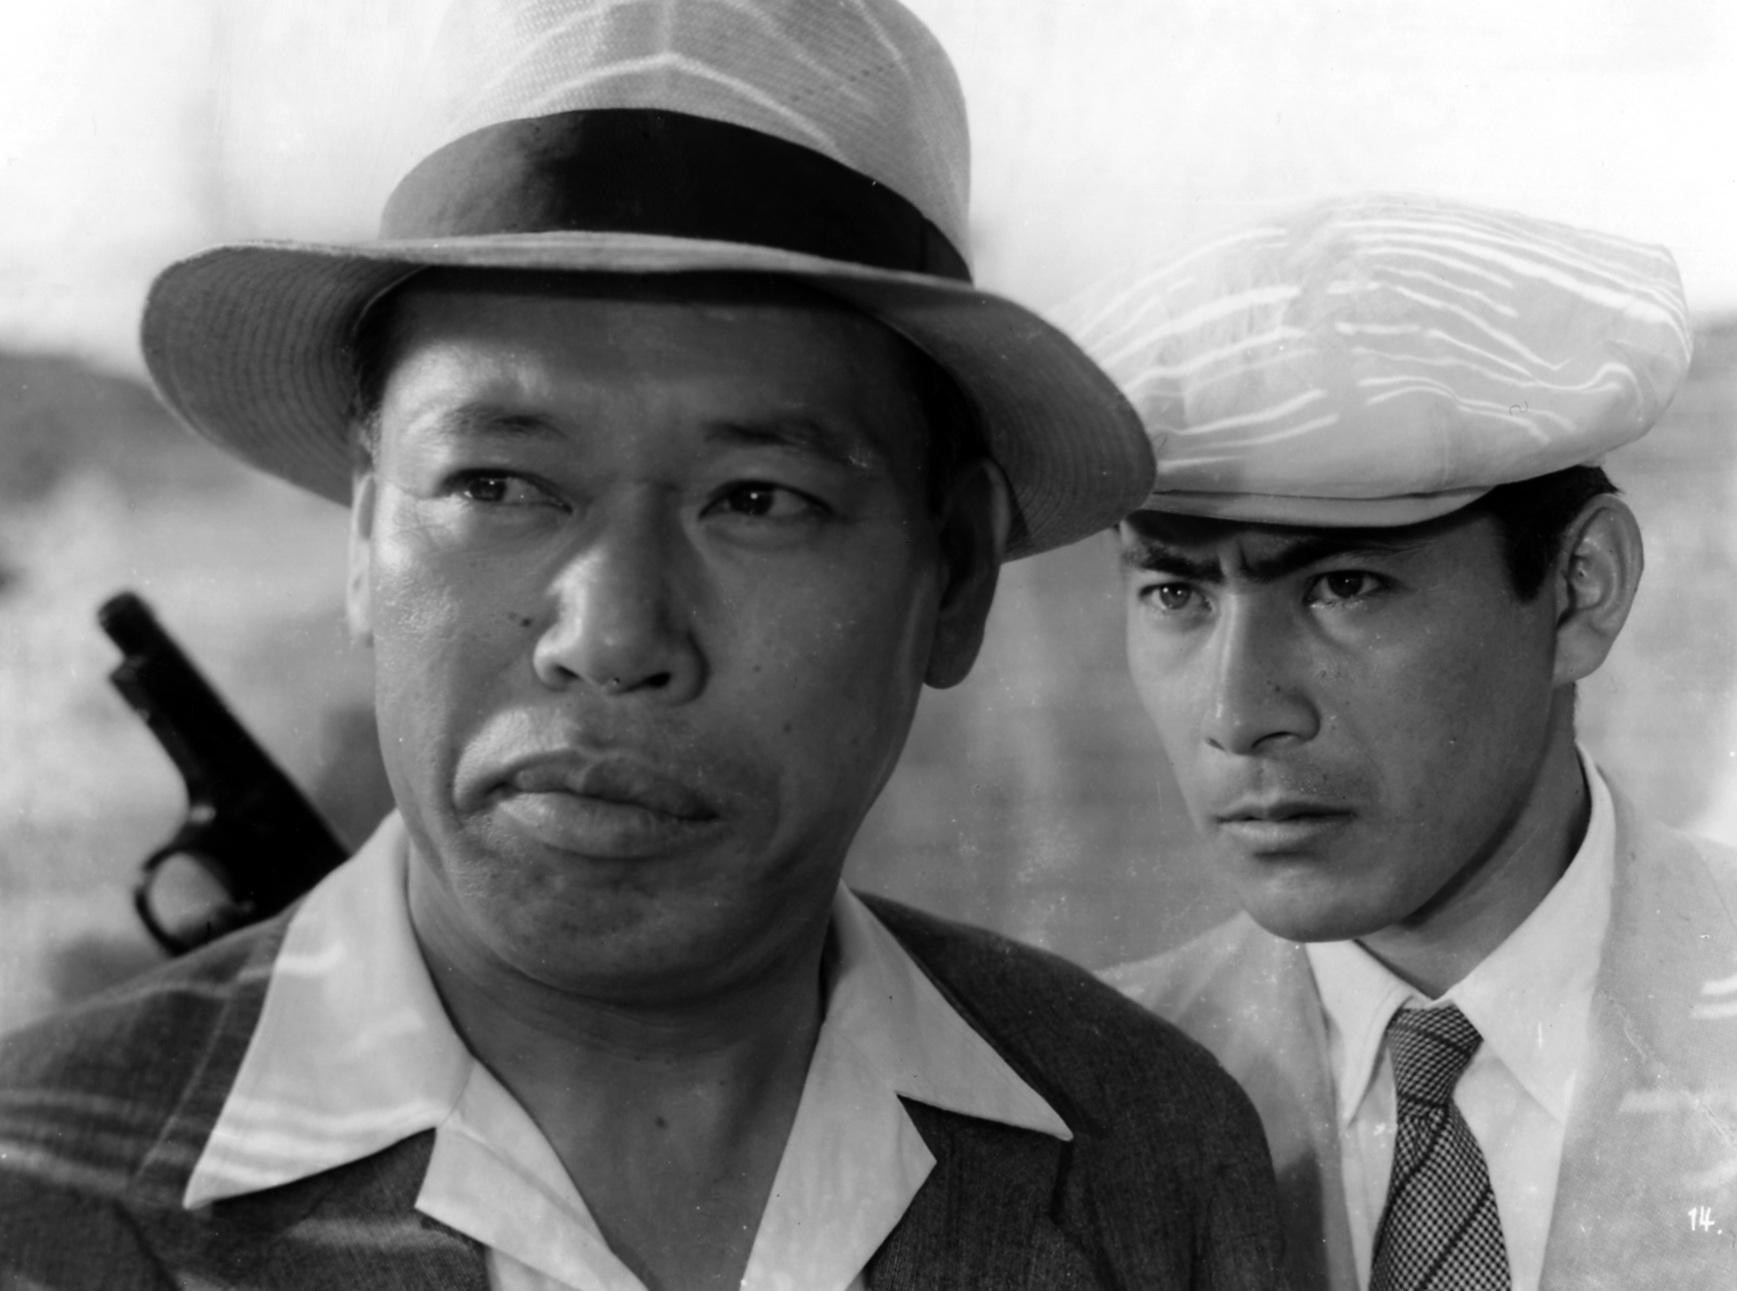 Takashi Shimura and Toshiro Mifune in Akira Kurosawa's STRAY DOG